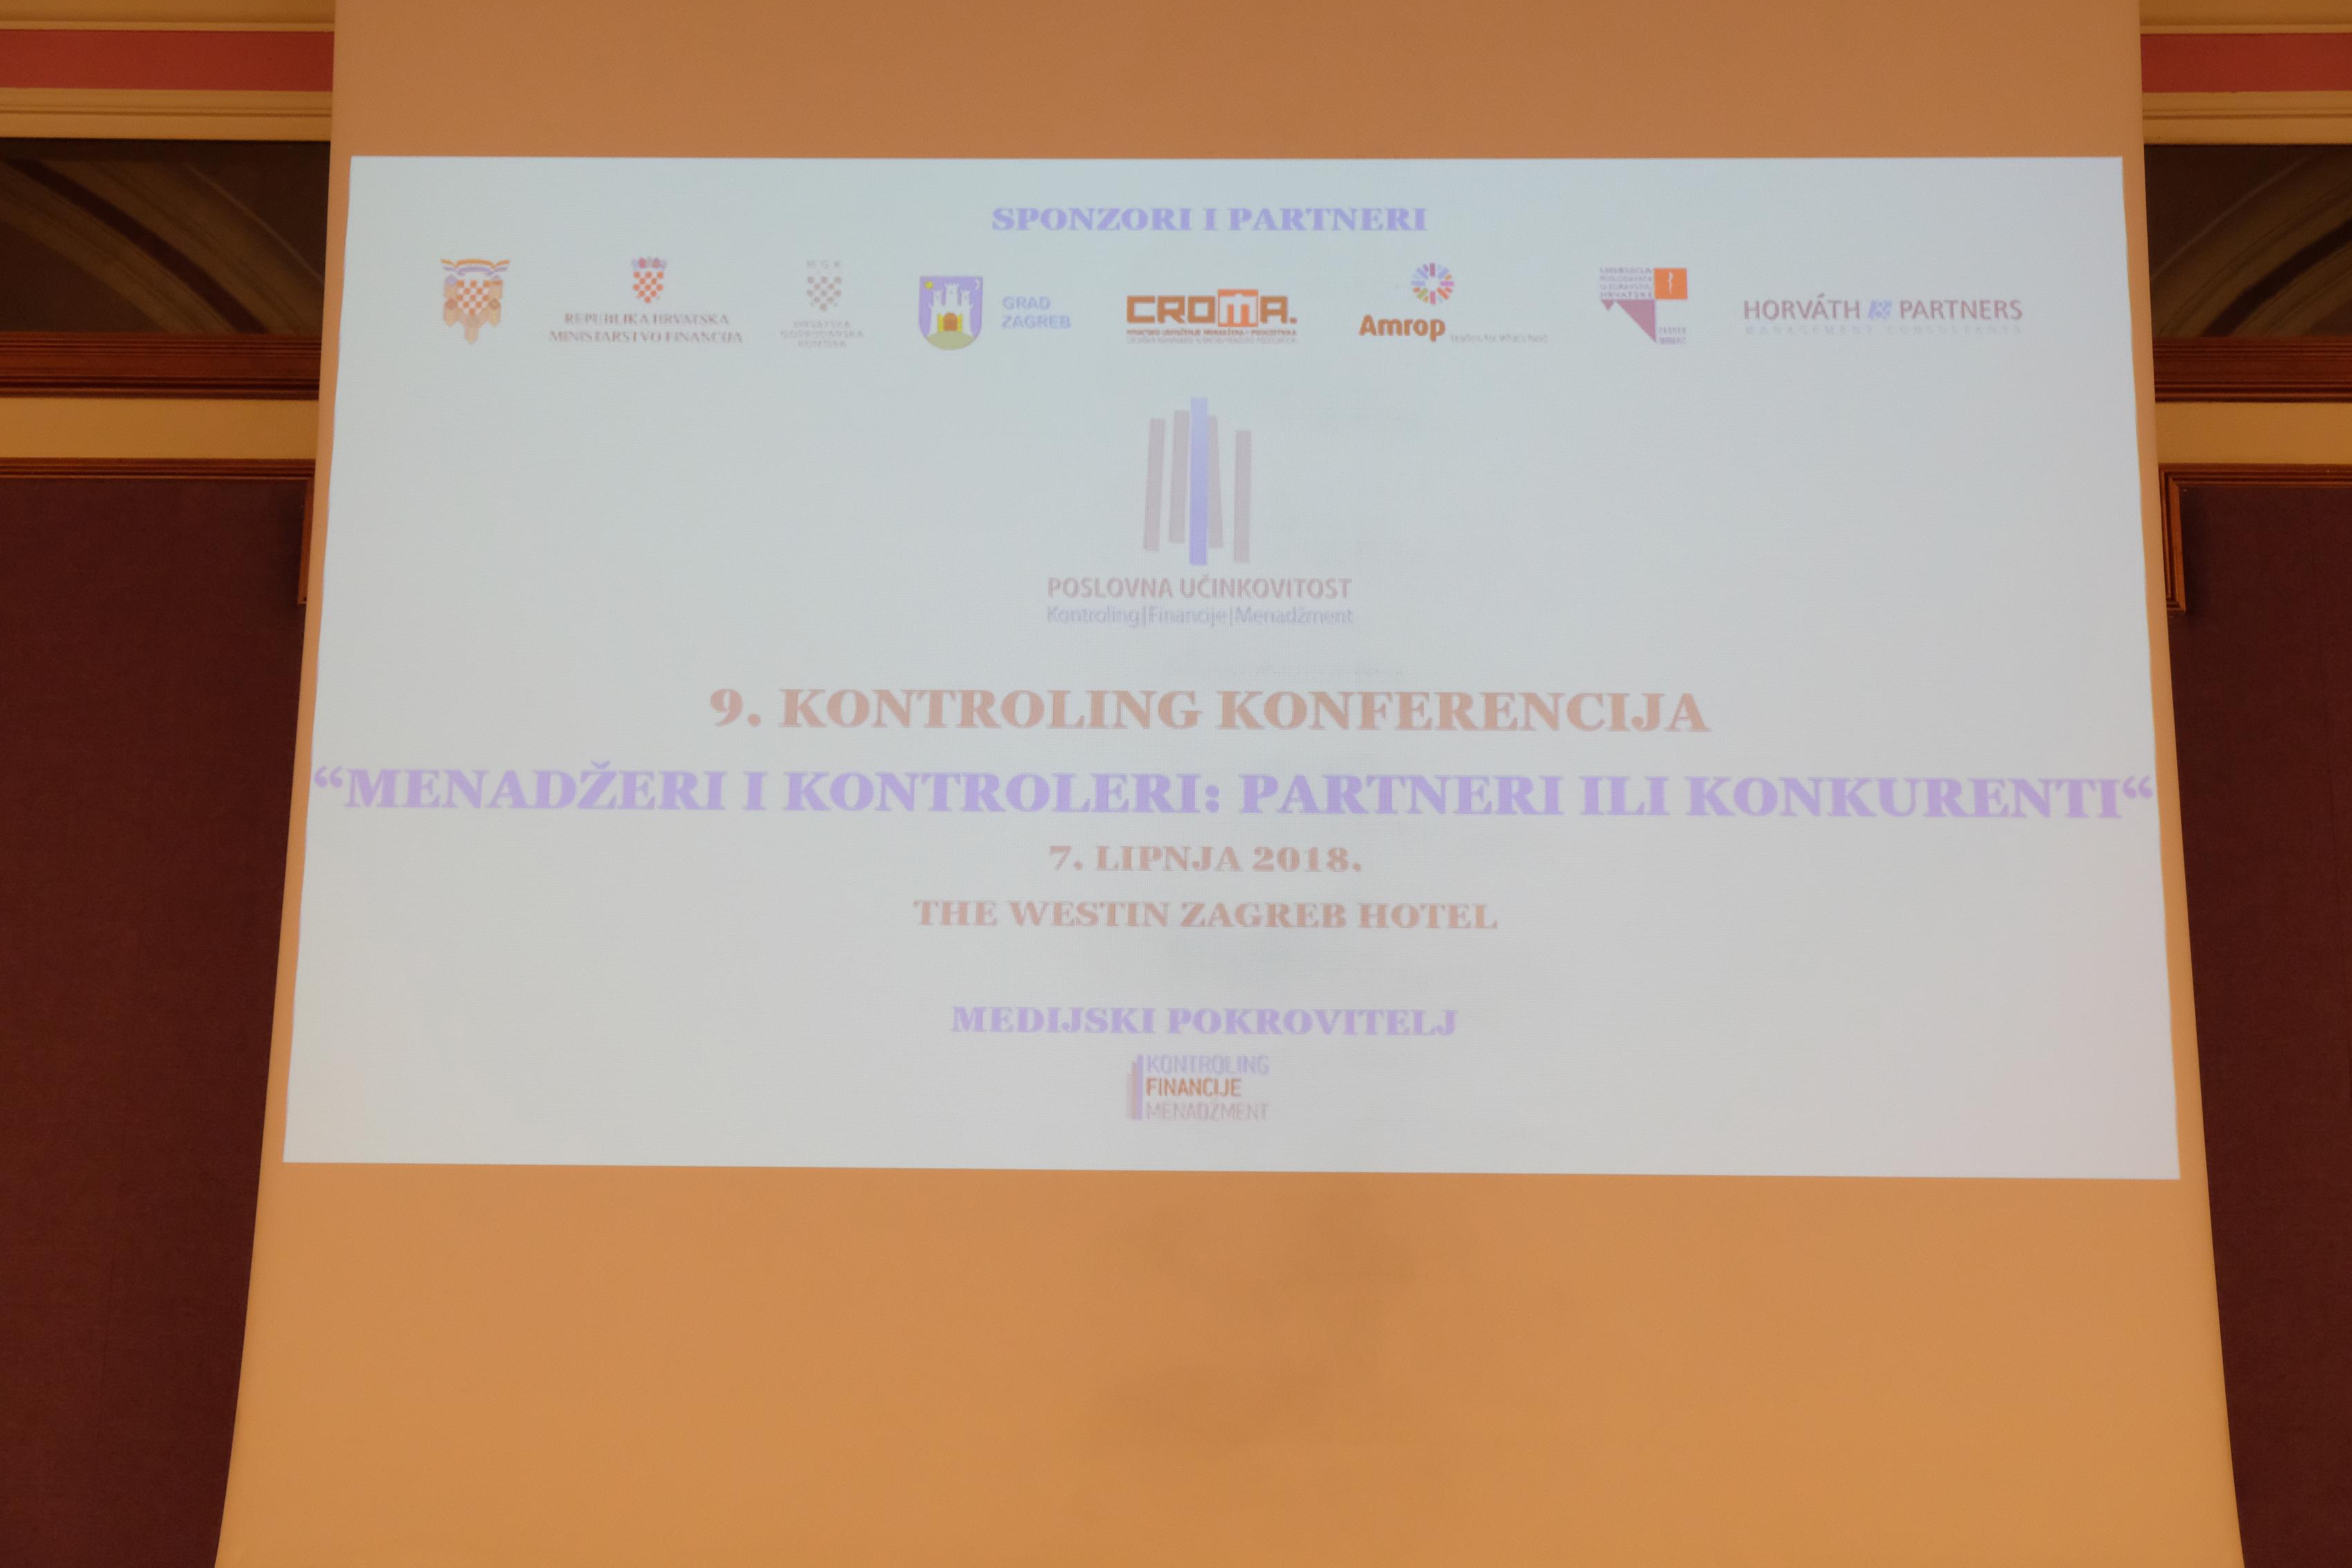 1 9kontroling konferencija